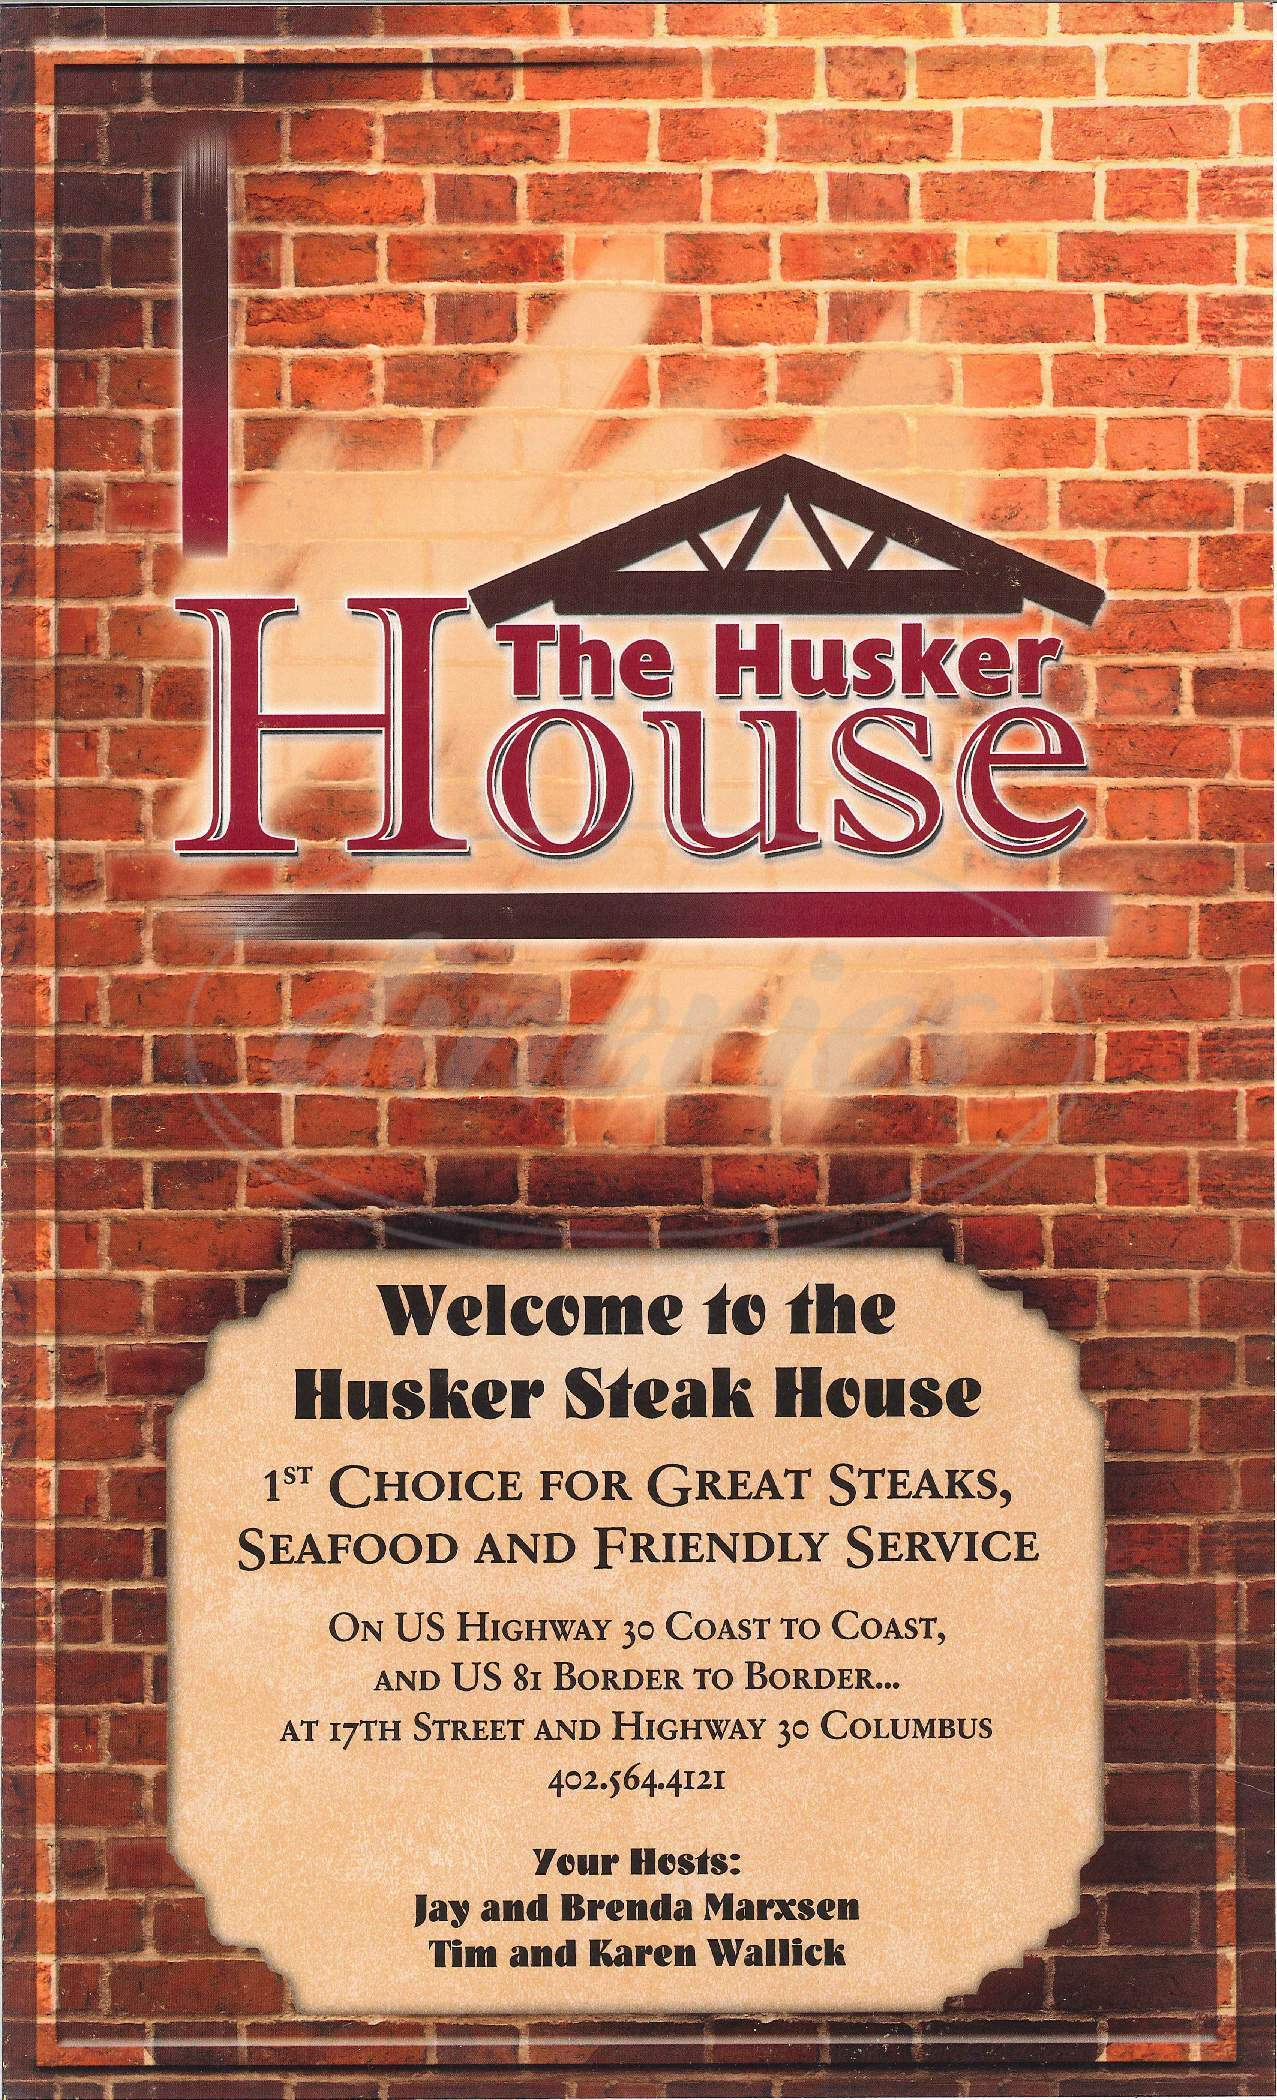 menu for Husker Steak House